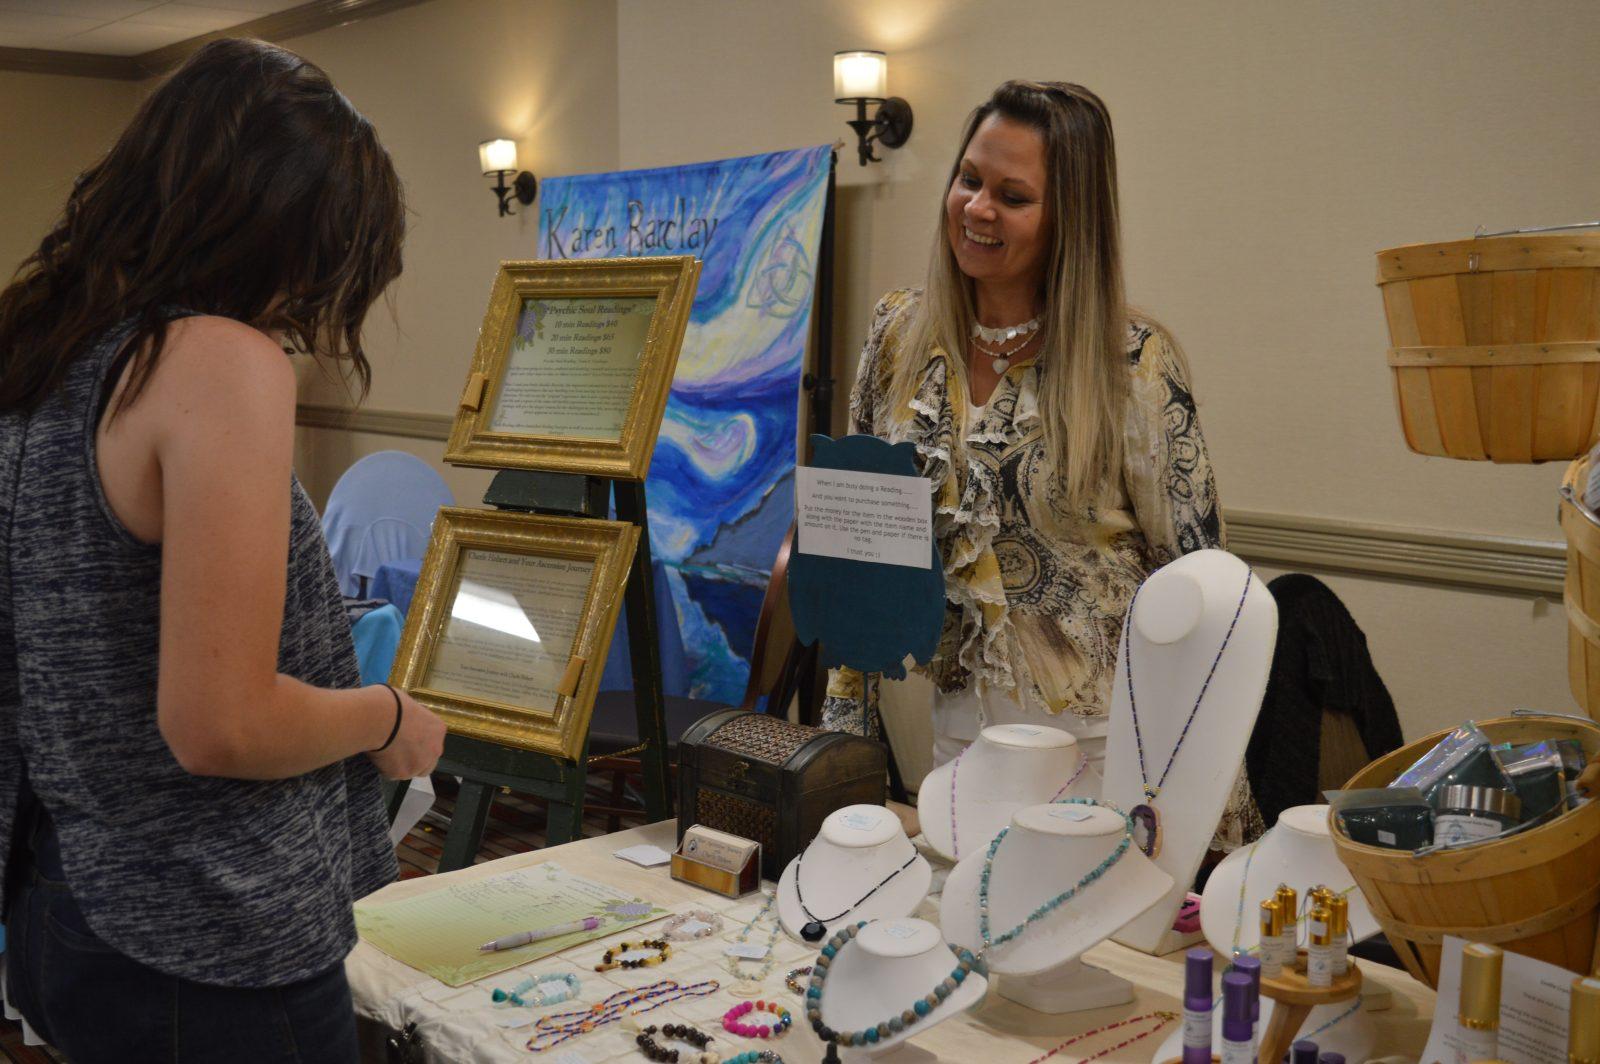 Psychic Fair hosts mediums from across North America